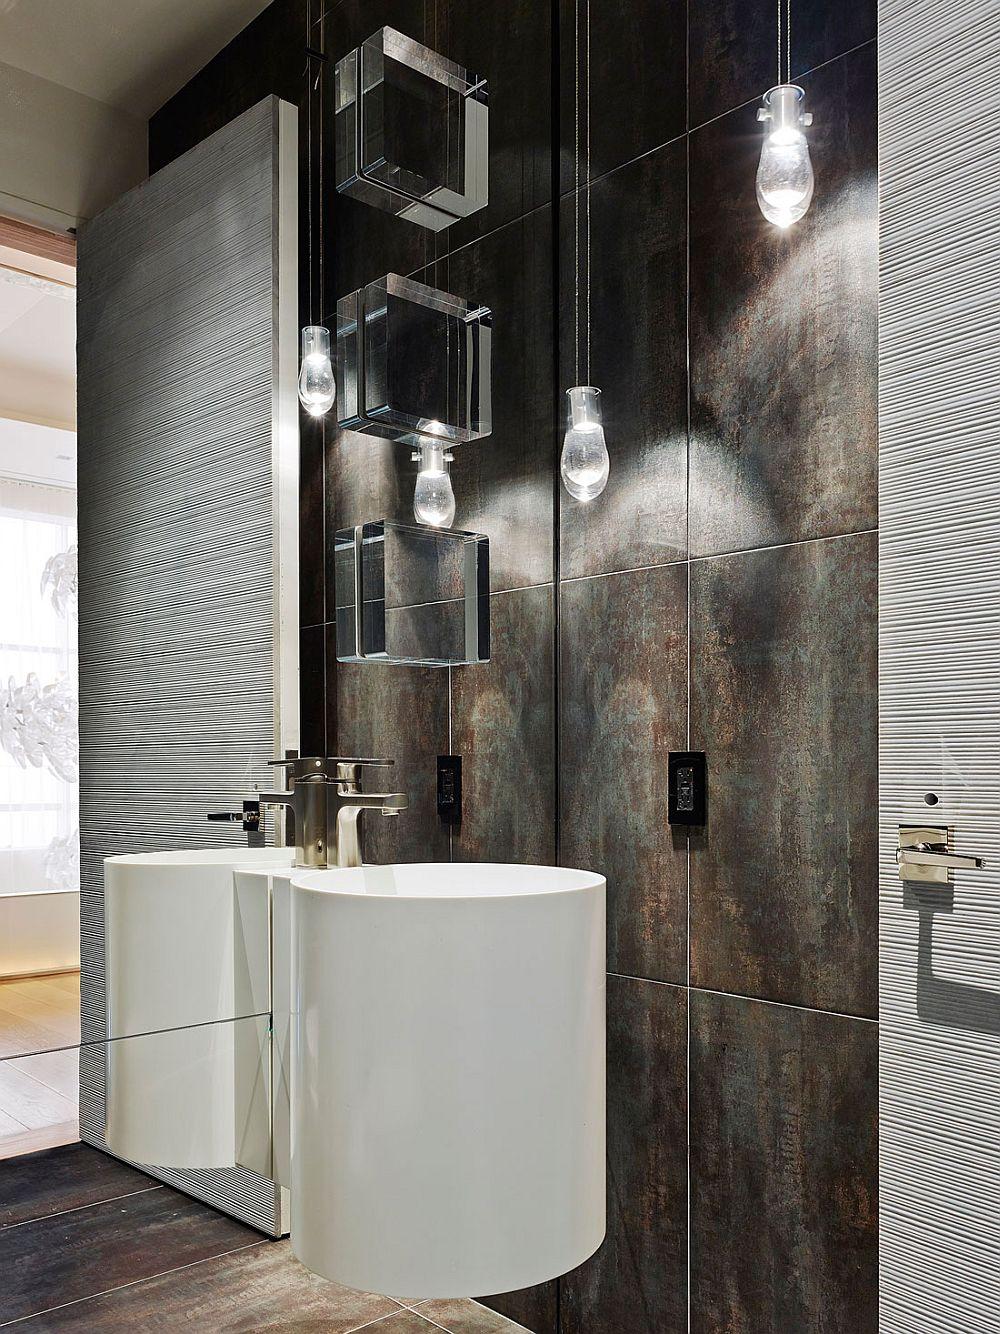 Minimal bathroom with smart lighting